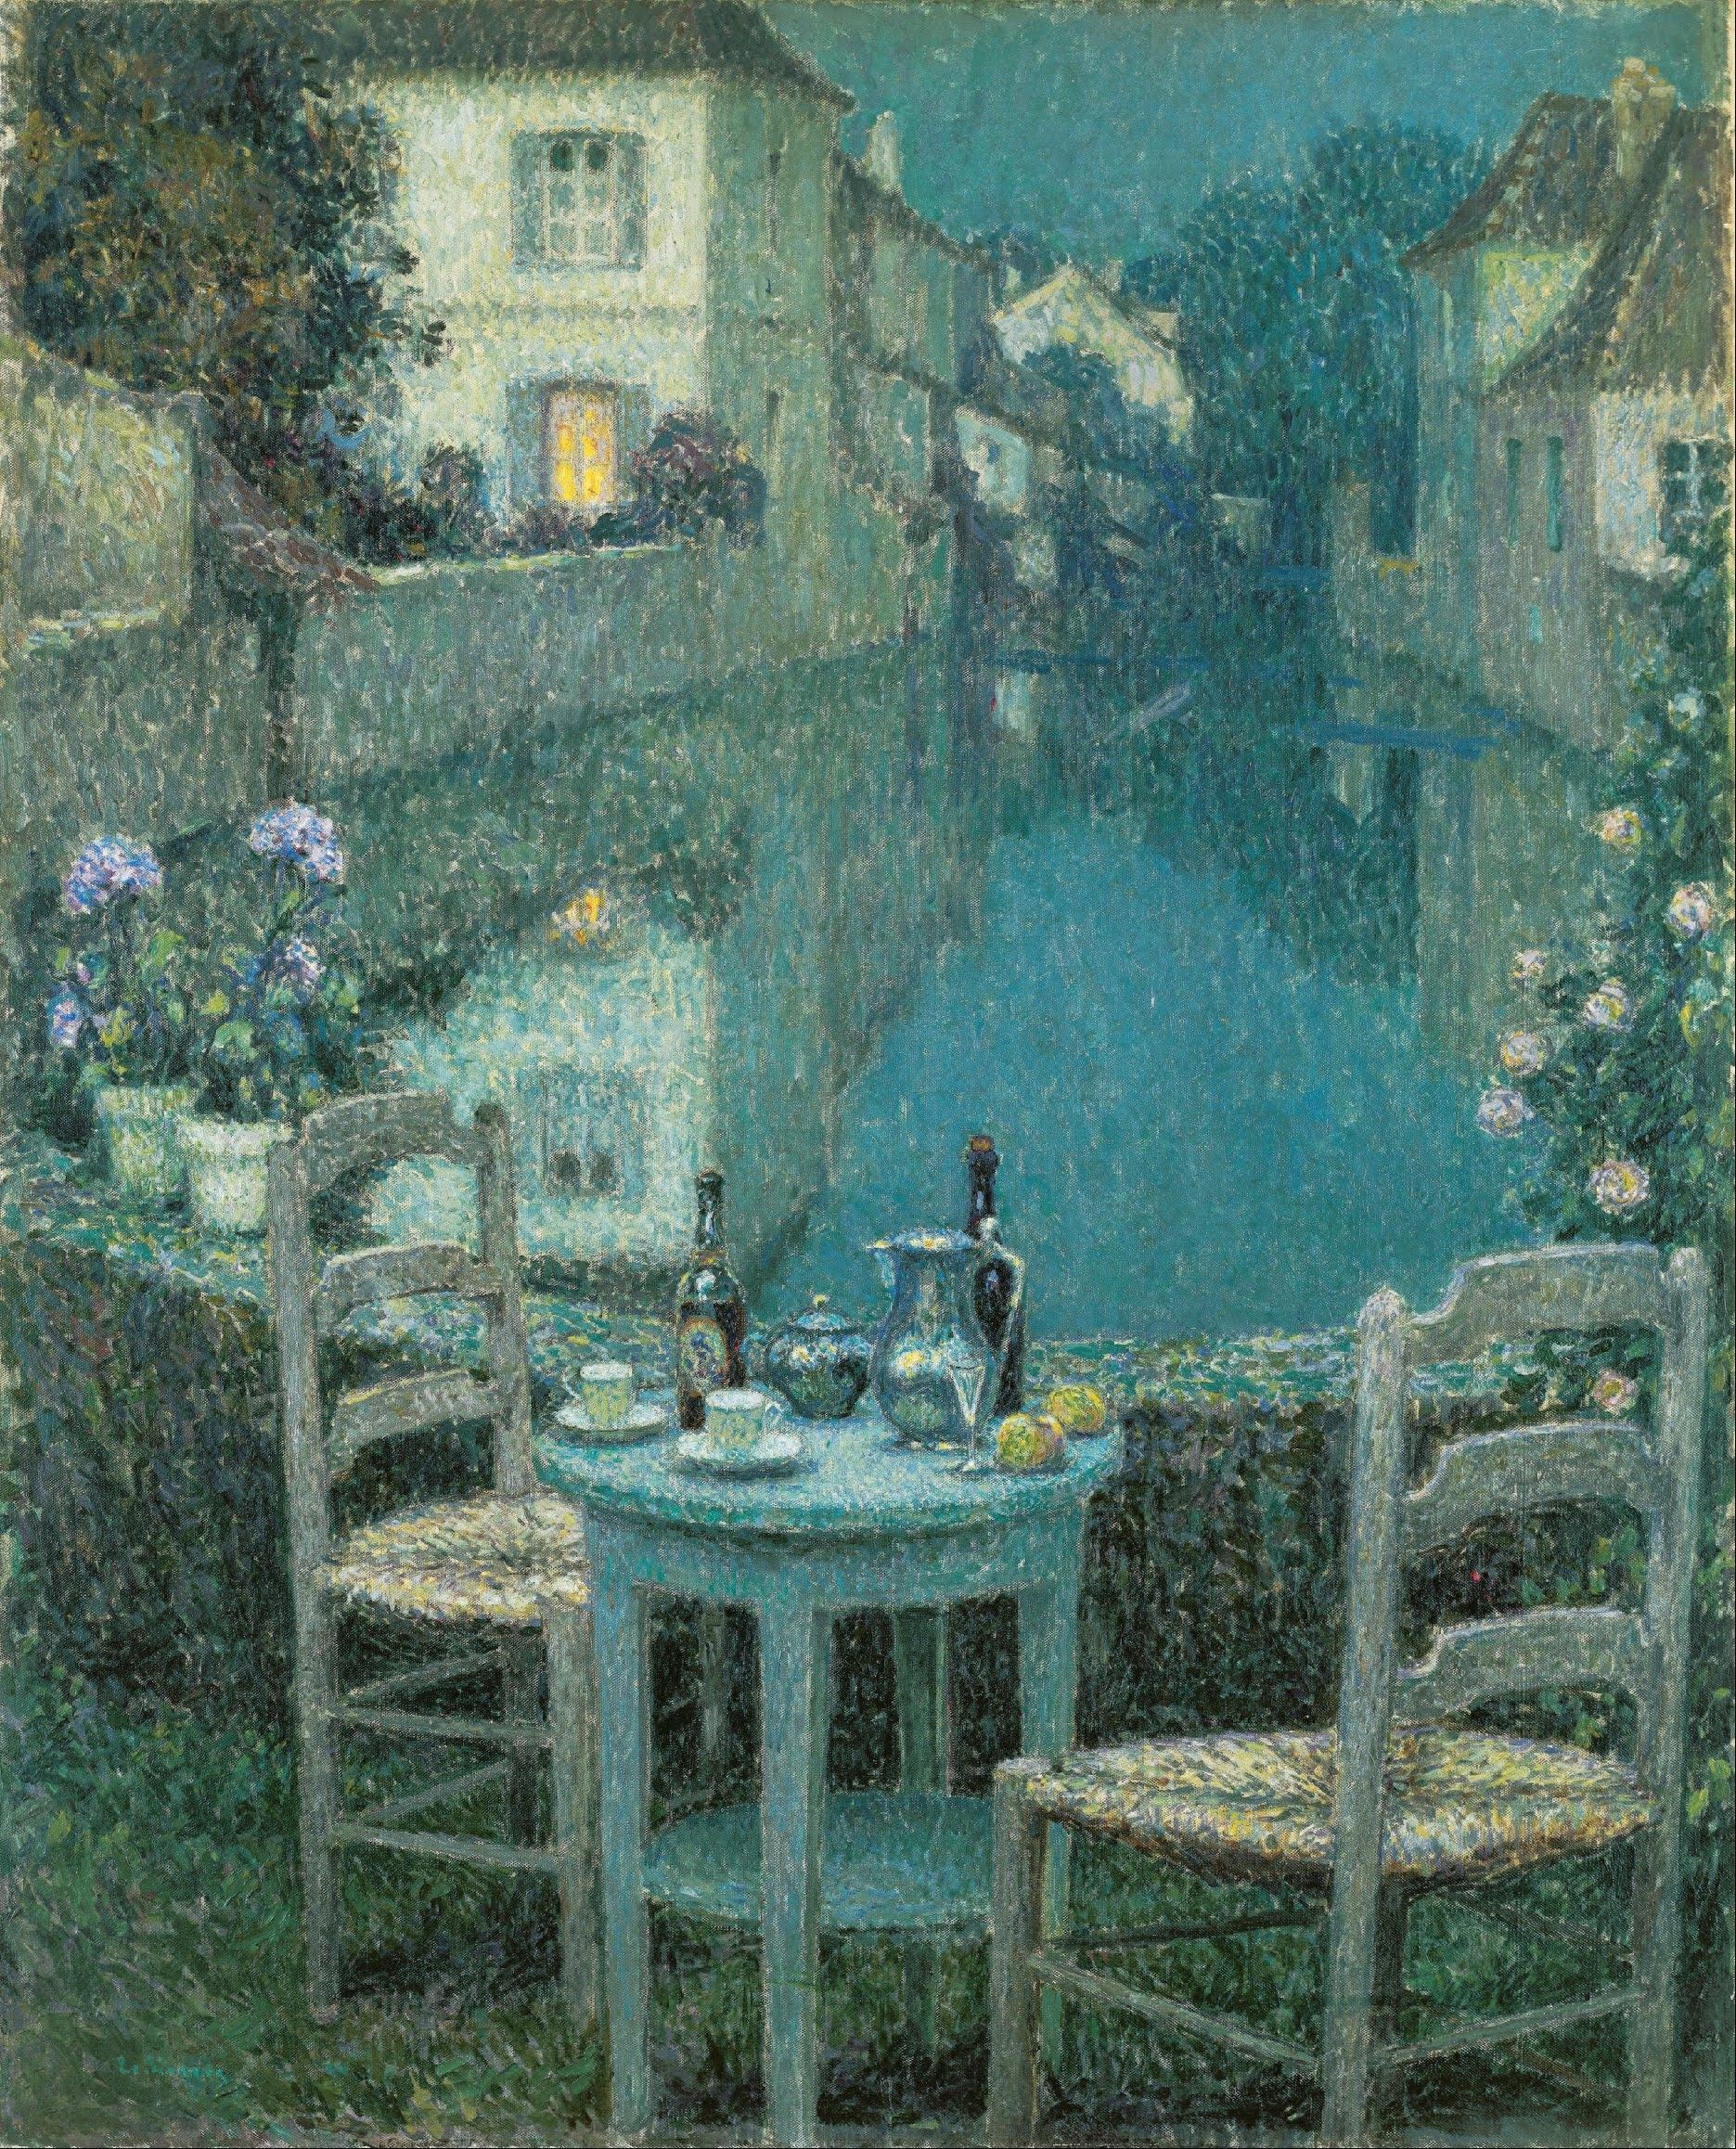 Lot 14 - HENRI LE SIDANER (1862-1939) Neige 59 x 49 in (150 x 125 cm) (Painted in 1924)